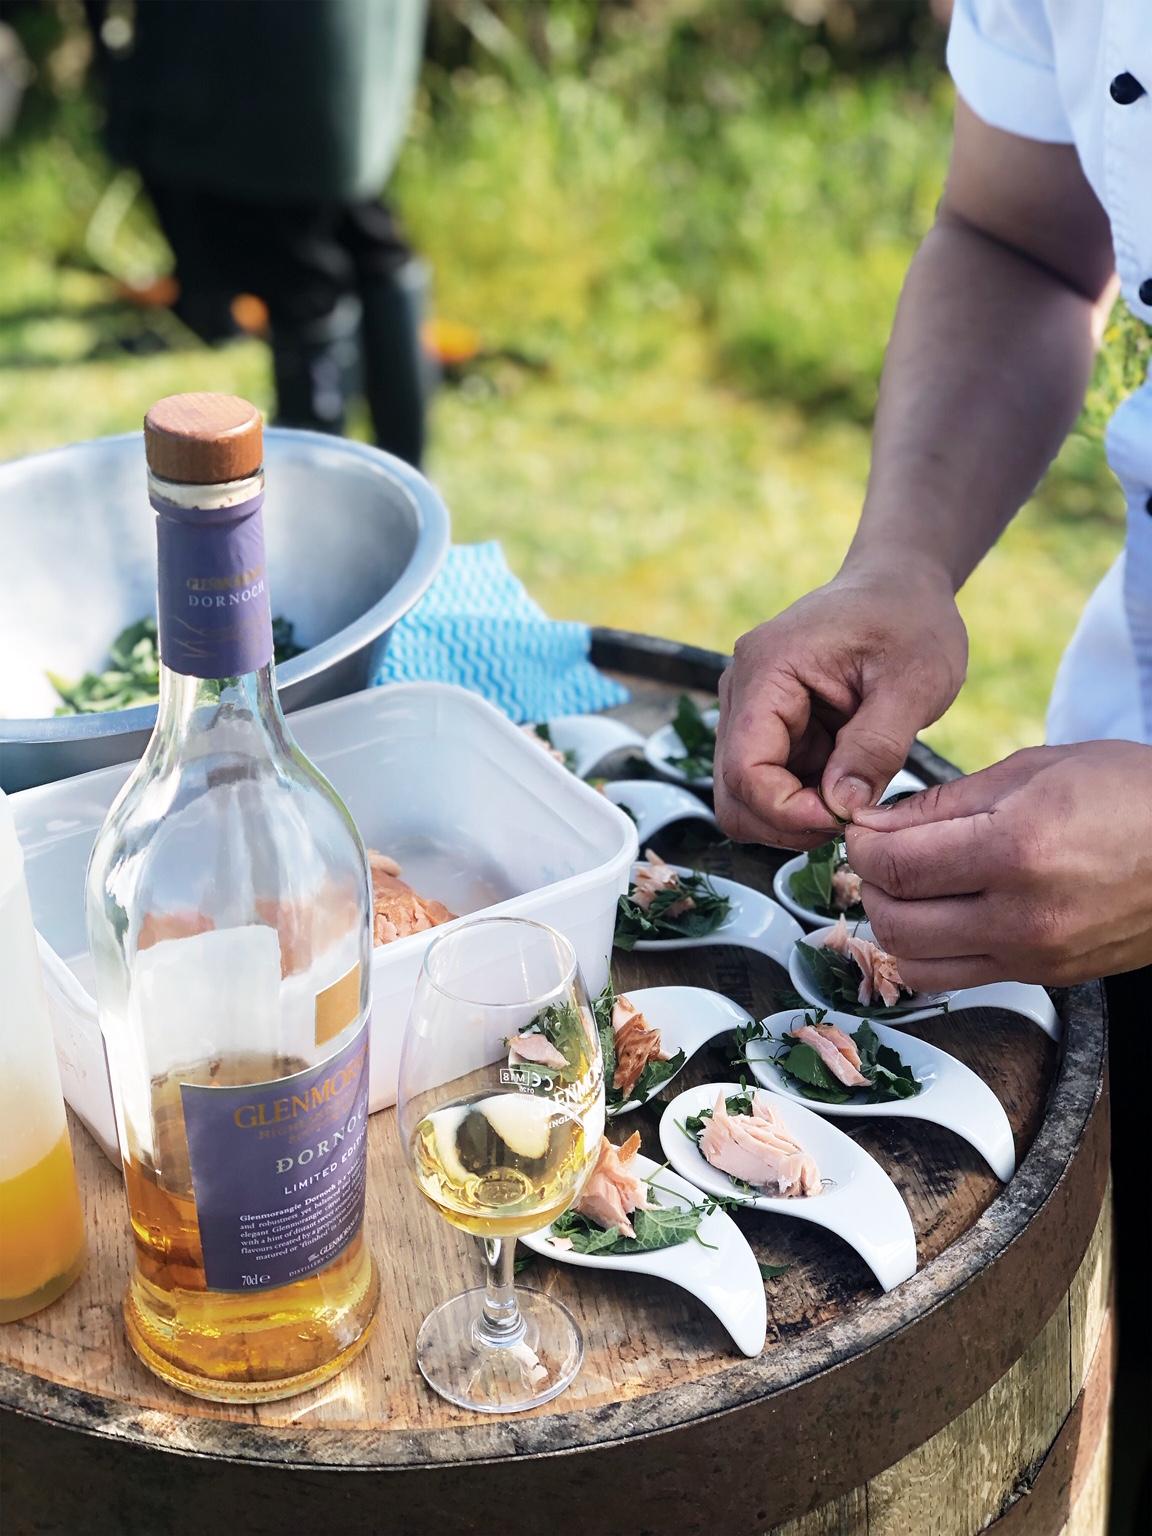 Glenmorangie Herz&Blut Seafood Whisky Tasting